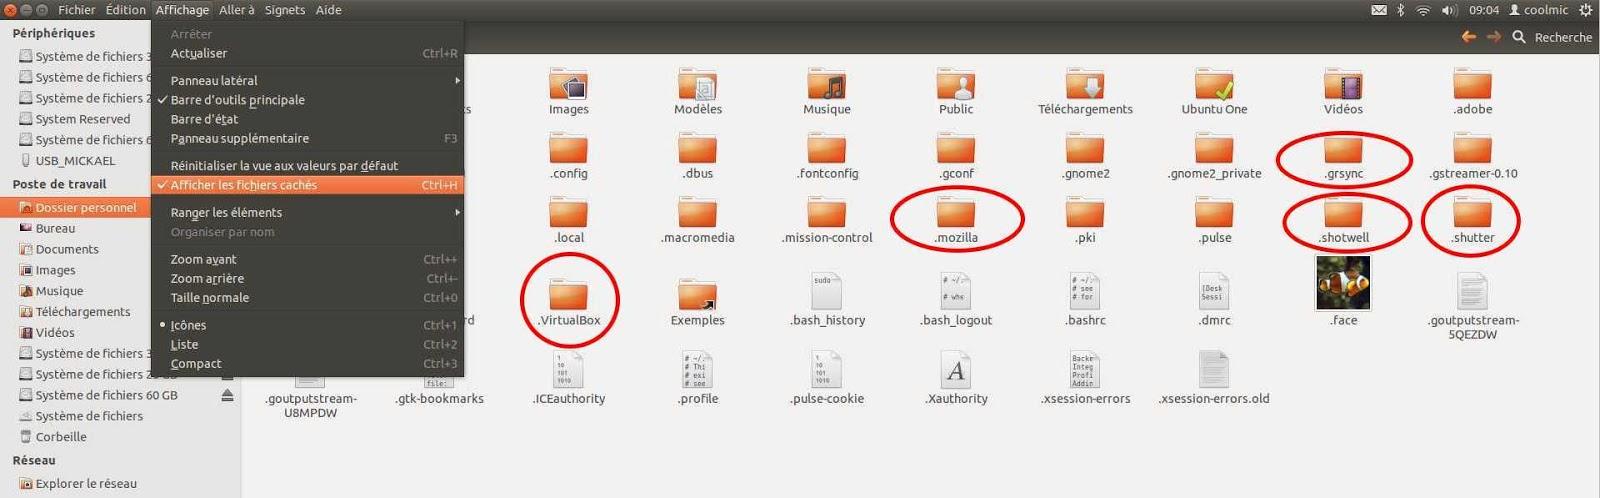 Comment Restaurer Fichier Supprime Corbeille